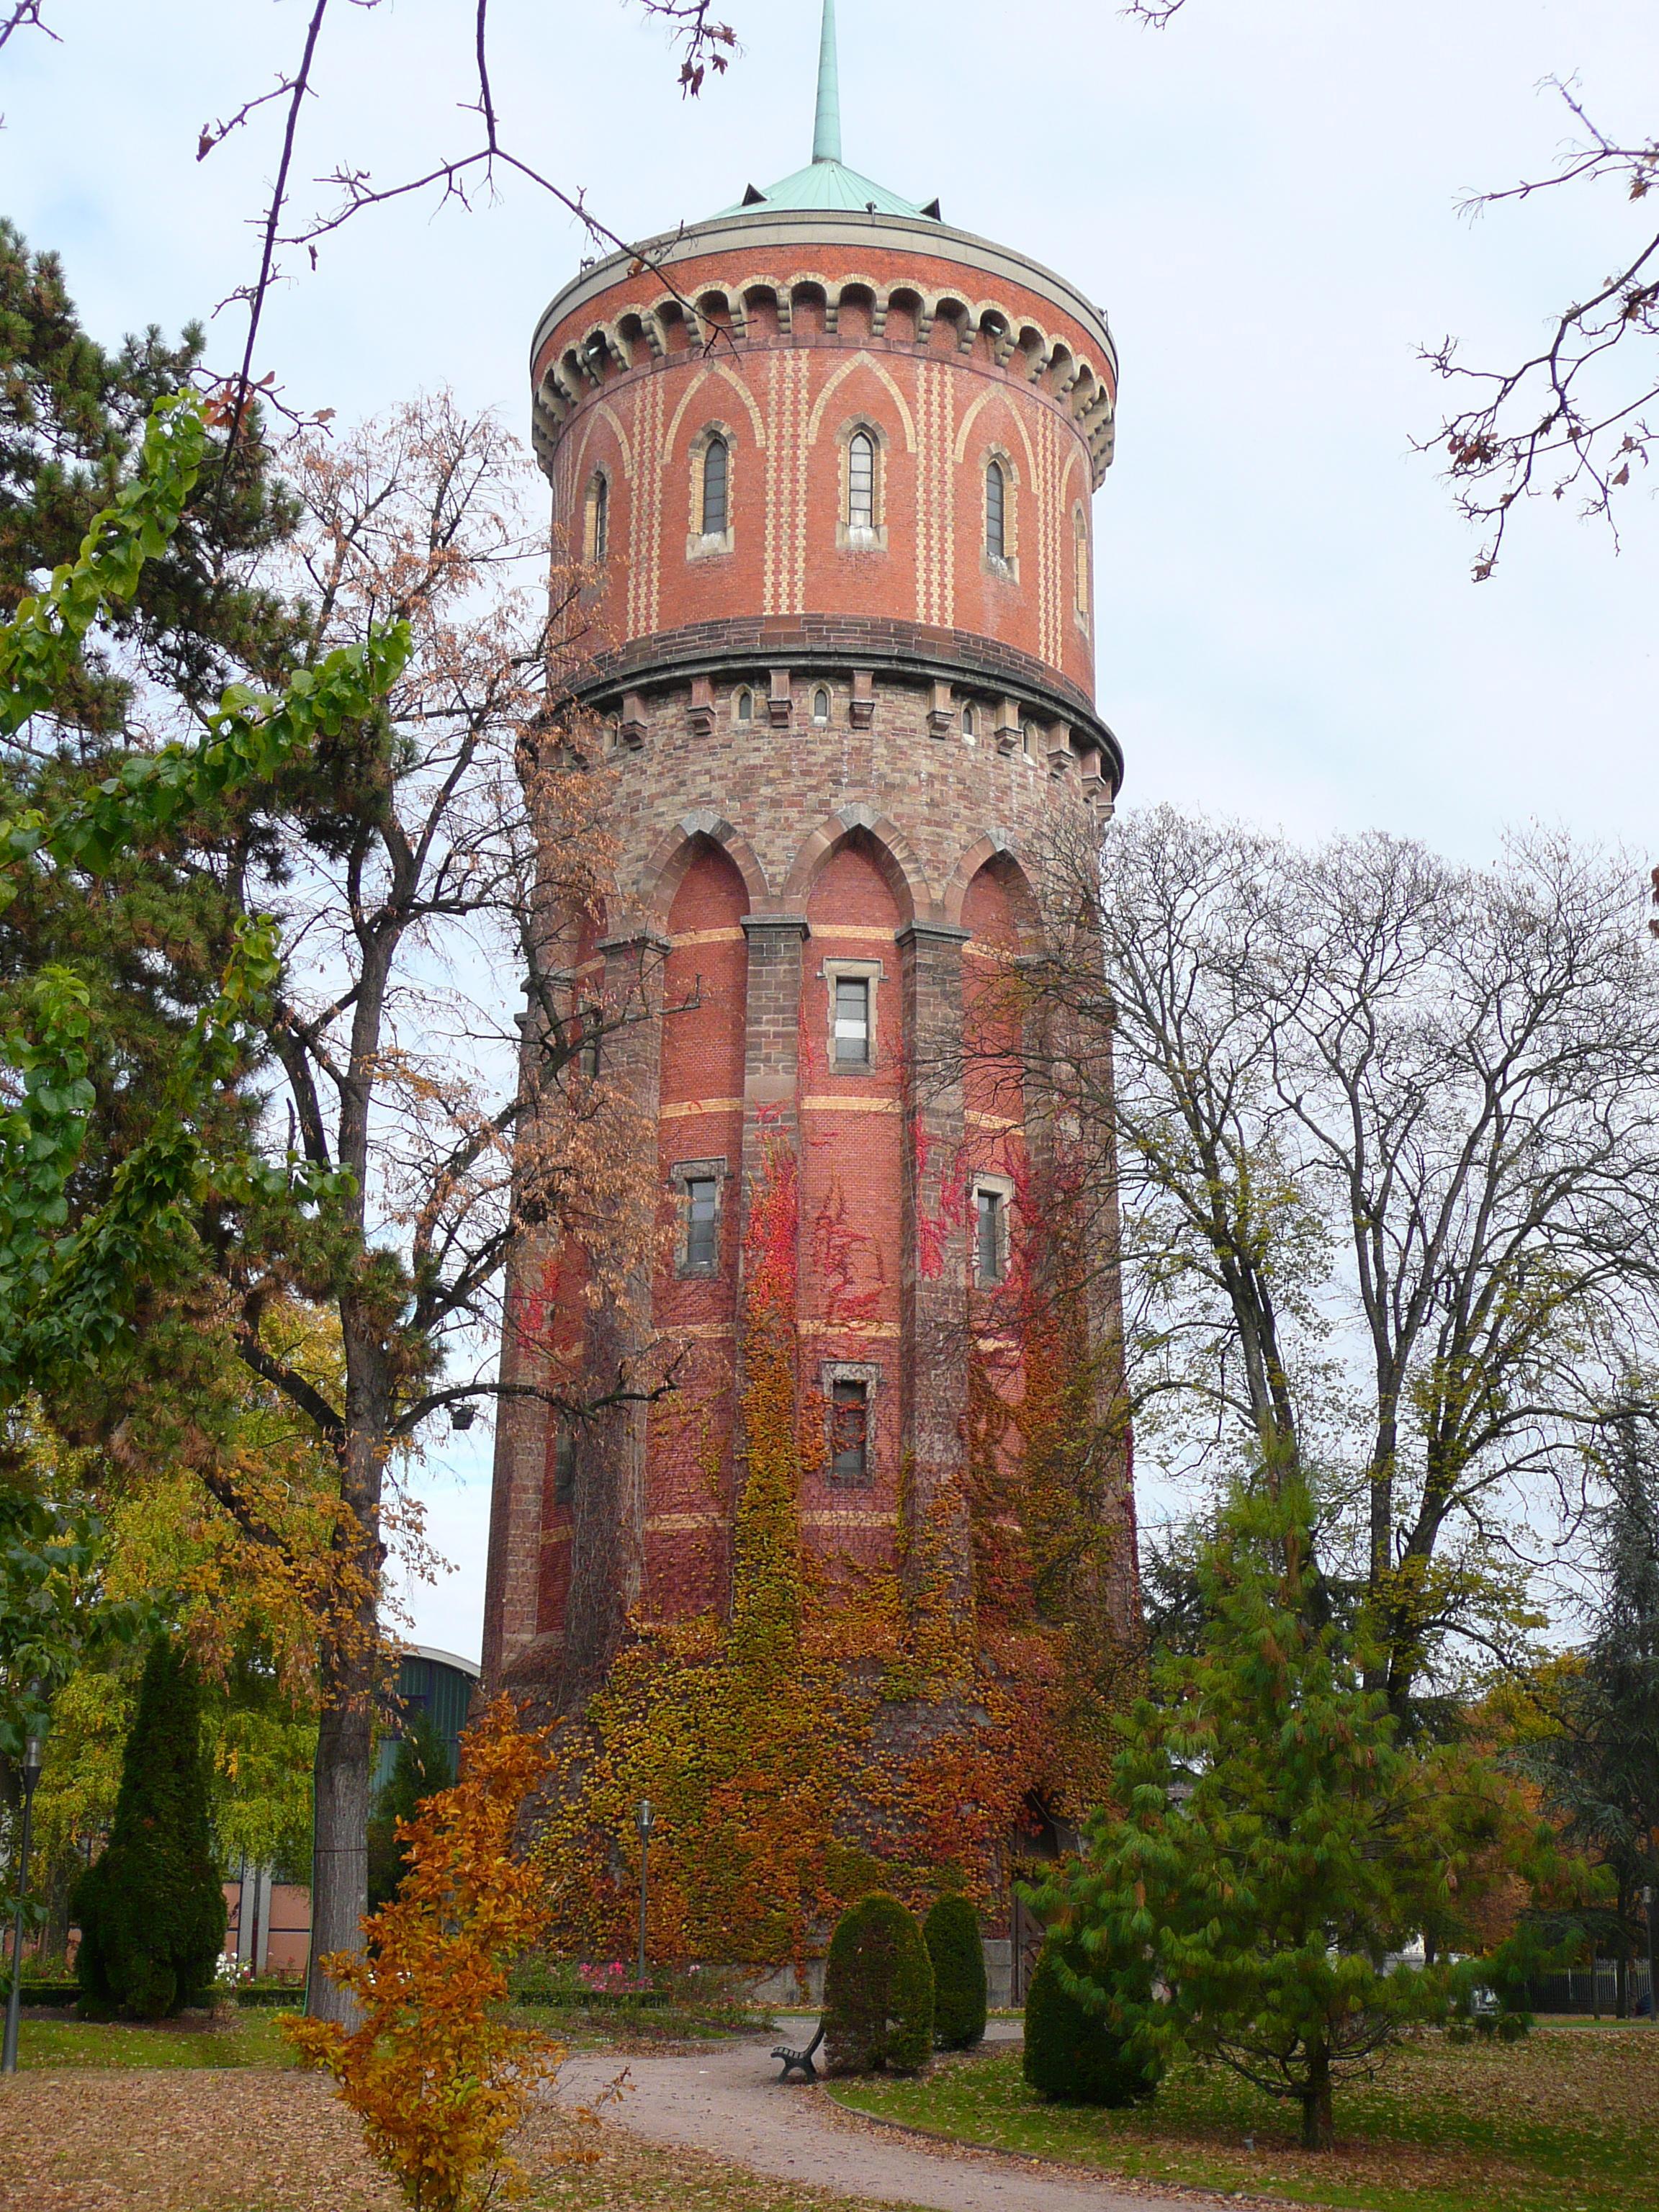 File:Château d\'eau, Colmar.jpg - Wikimedia Commons